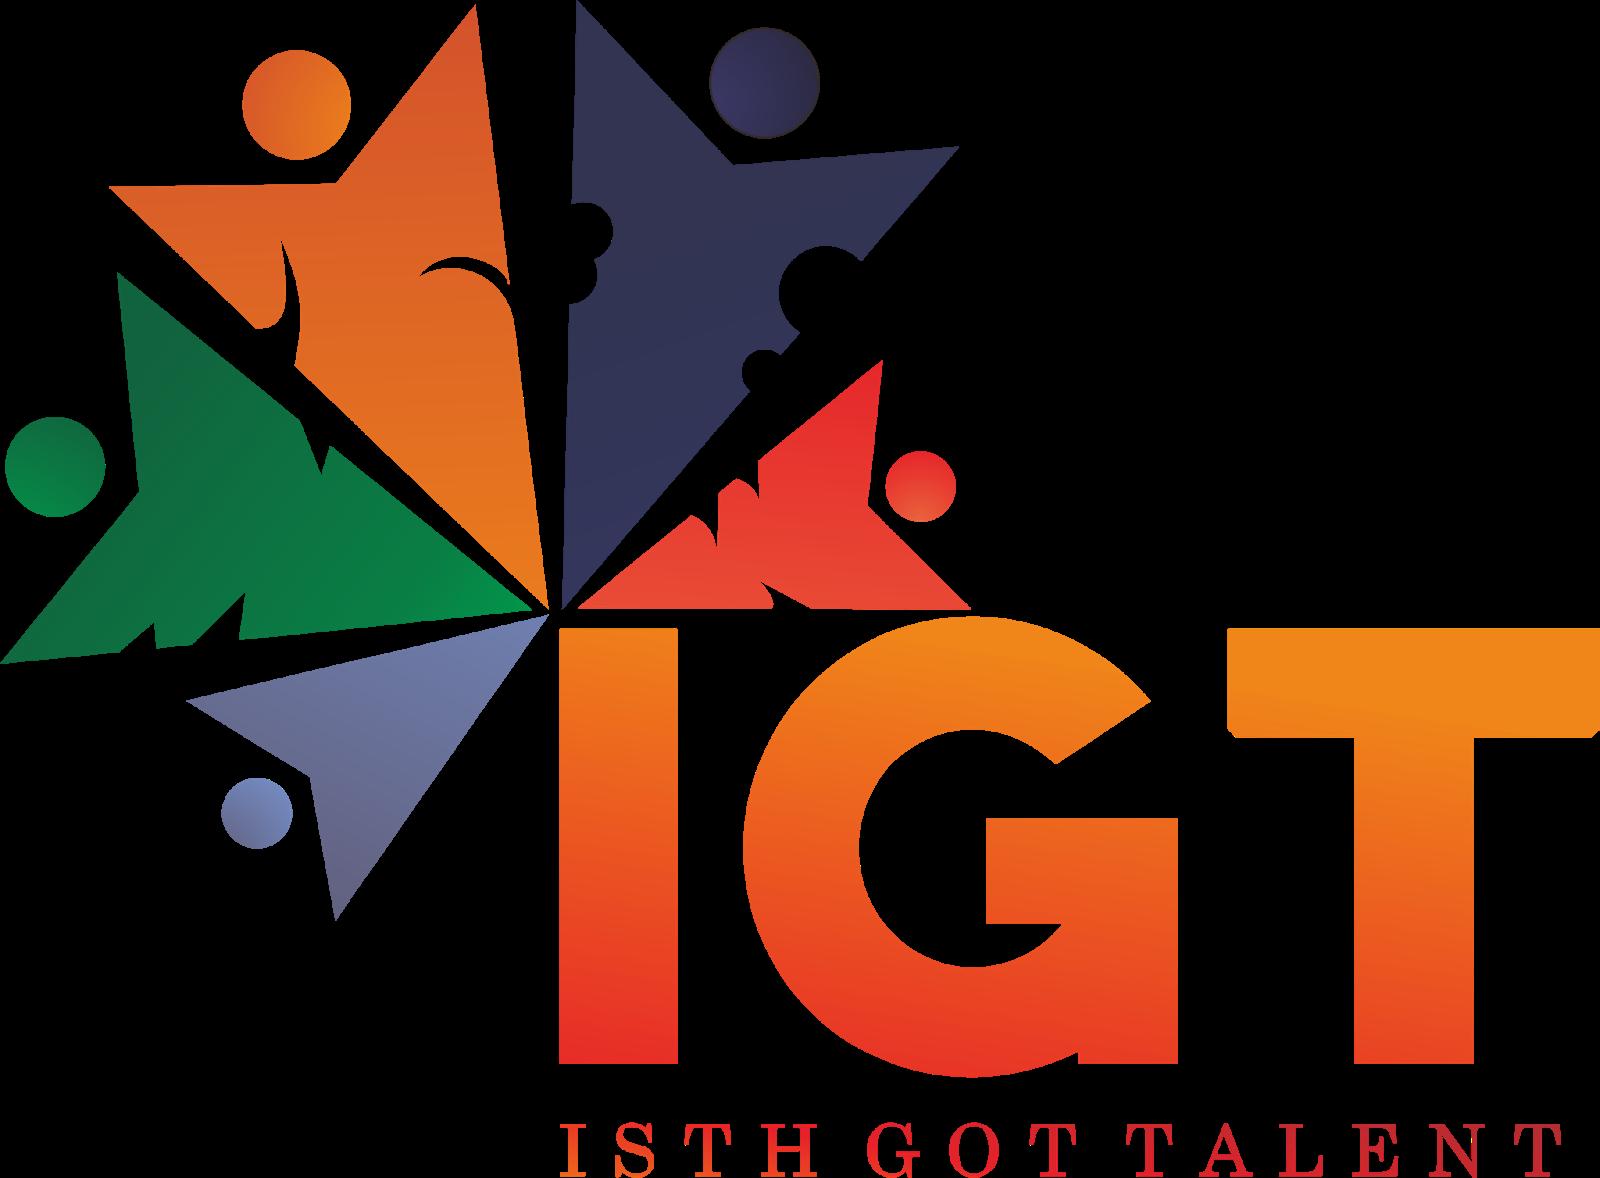 Logo ISTH Got Talent